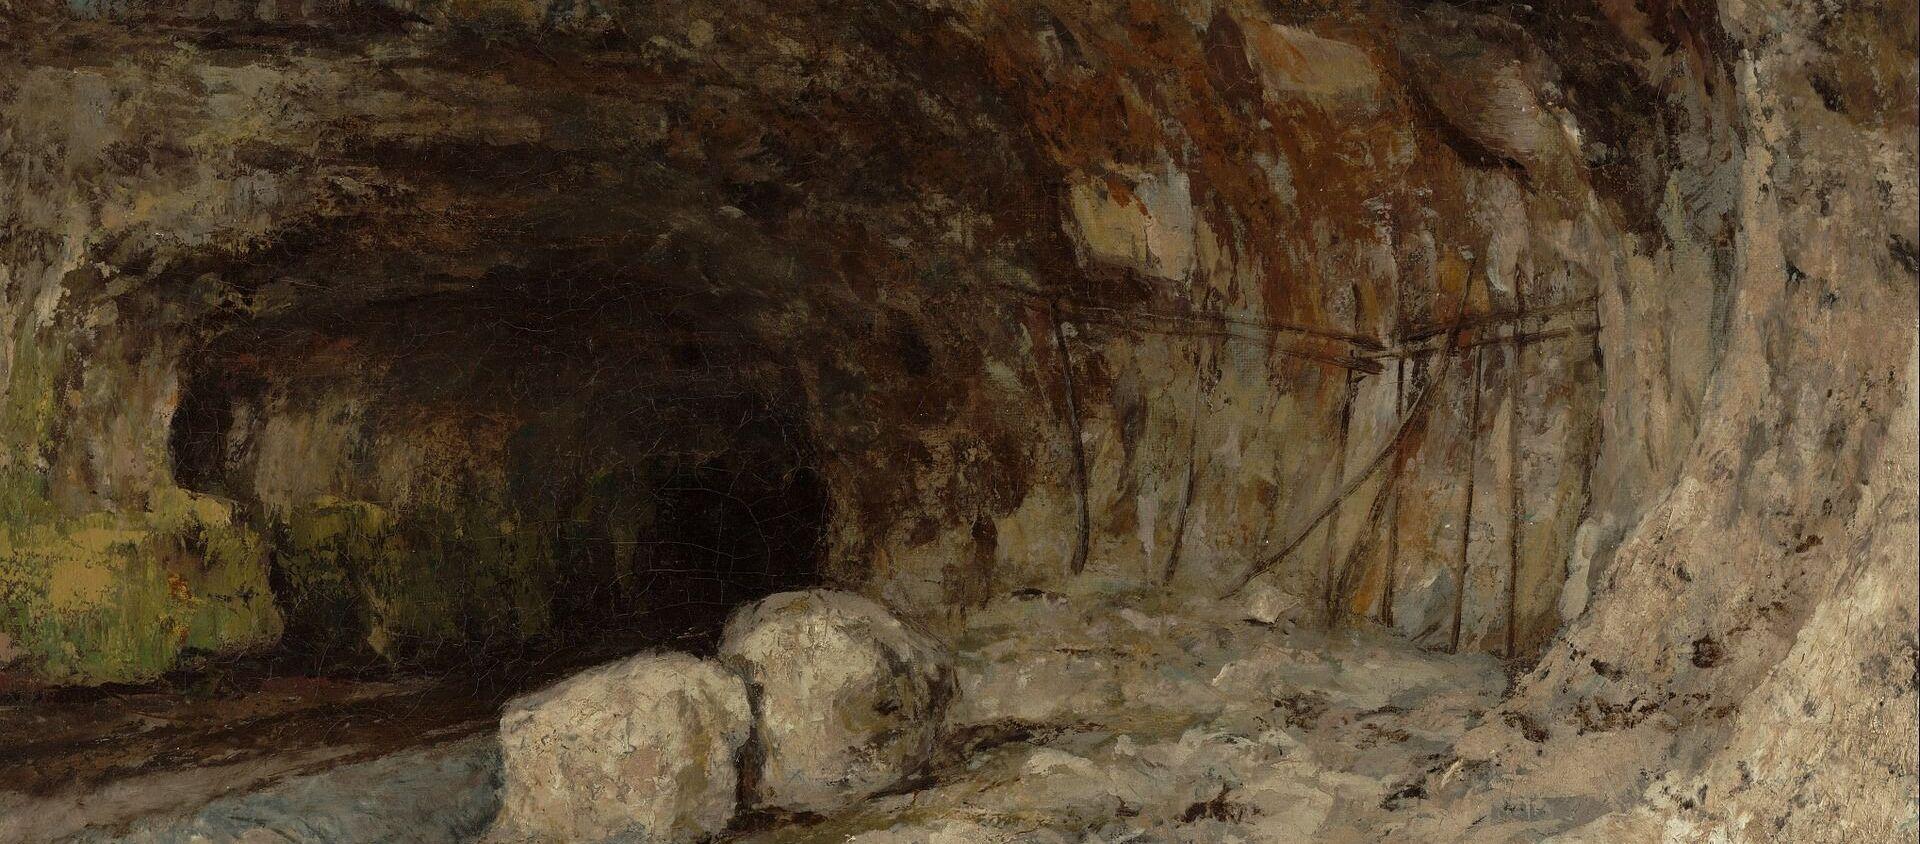 Пећина - Sputnik Србија, 1920, 26.11.2020